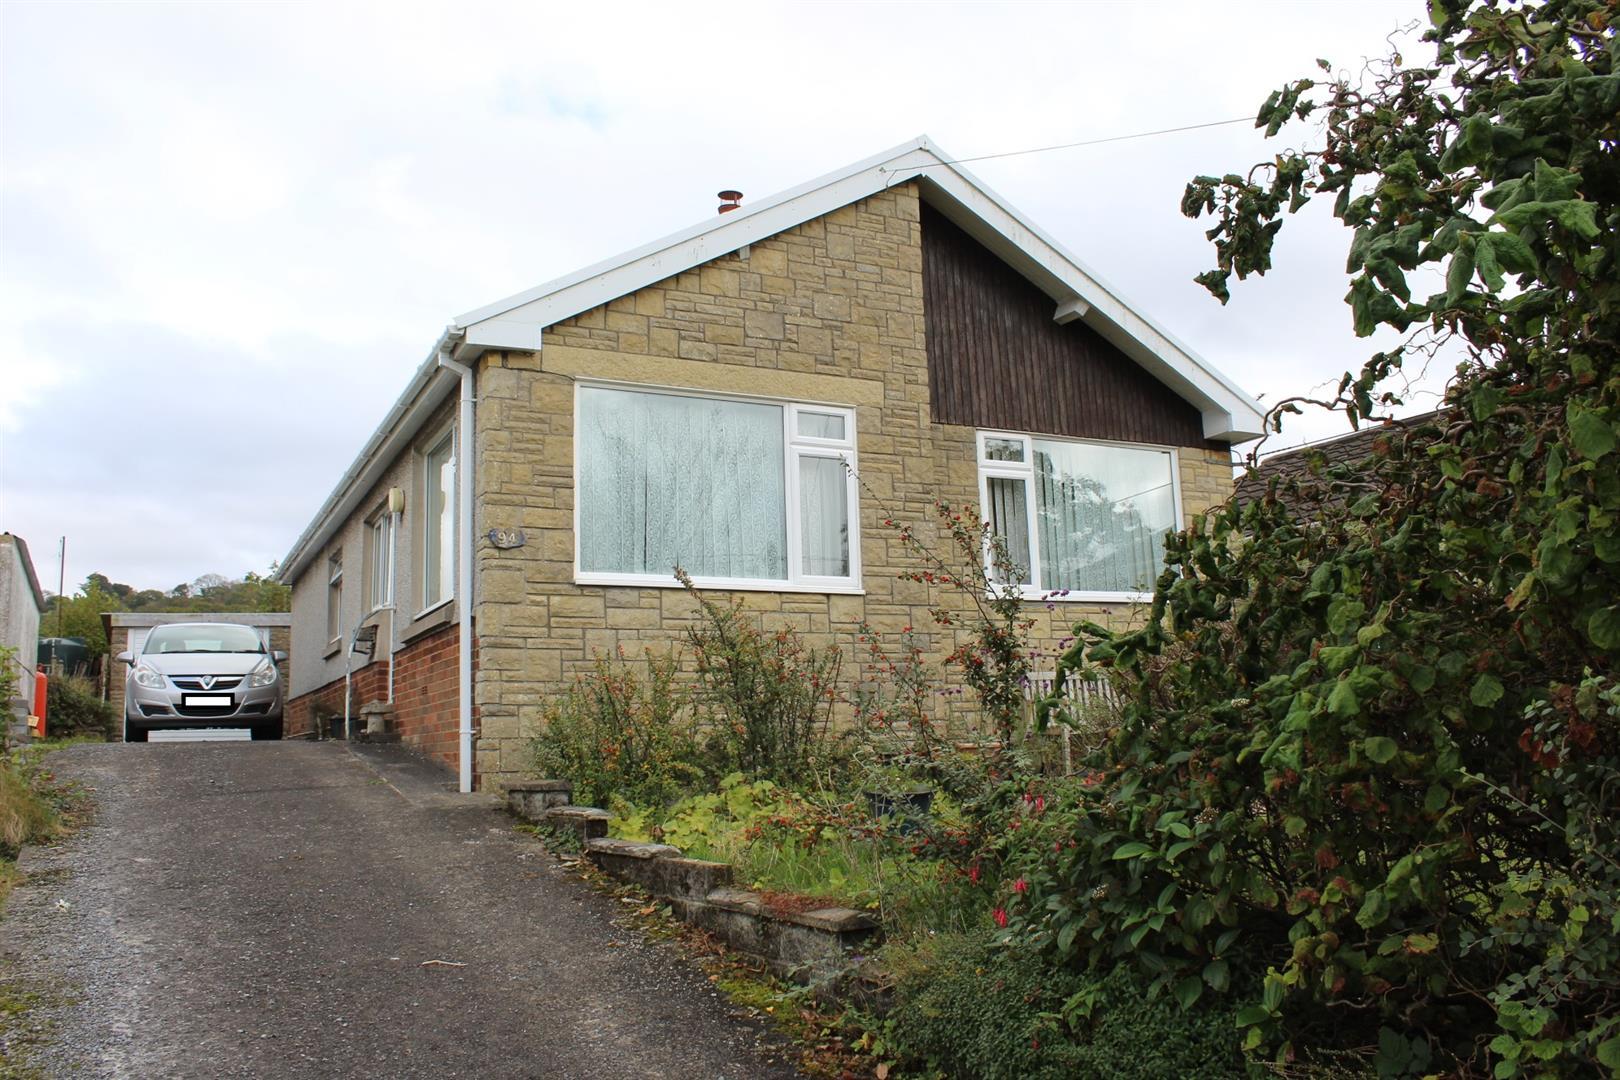 94 Betws Road, Betws, Ammanford, Carmarthenshire